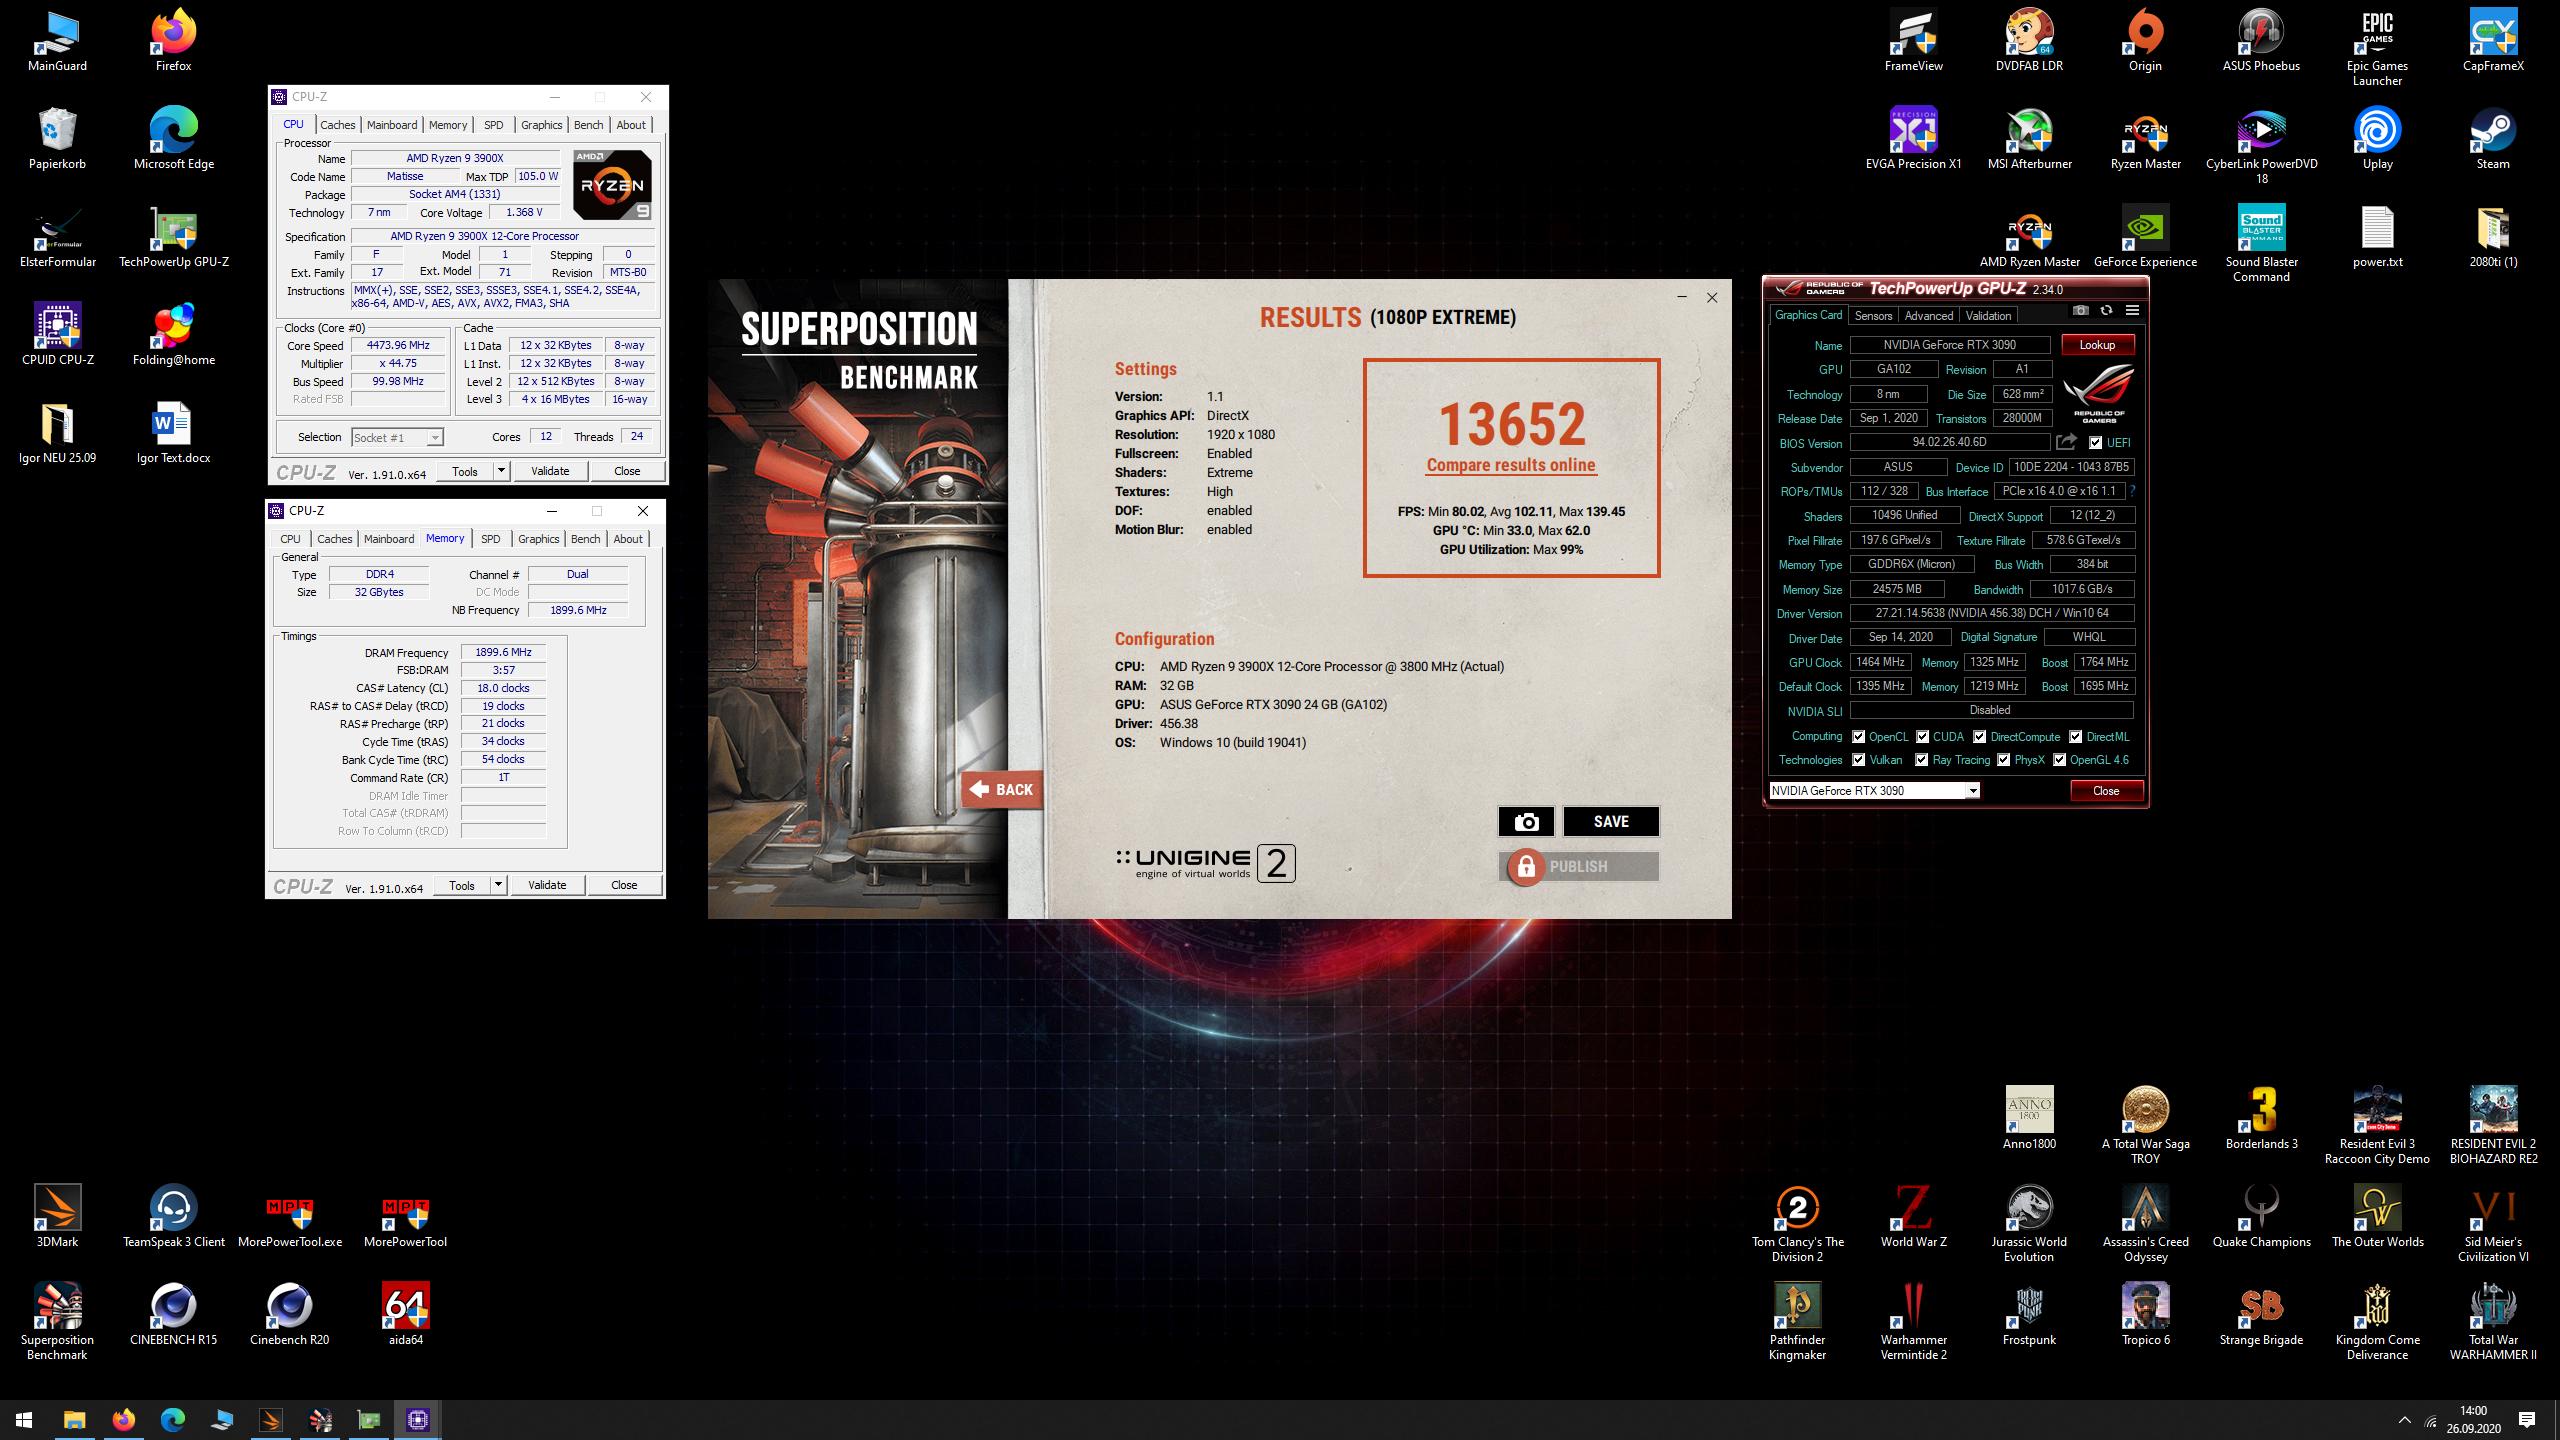 Screenshot (247).png